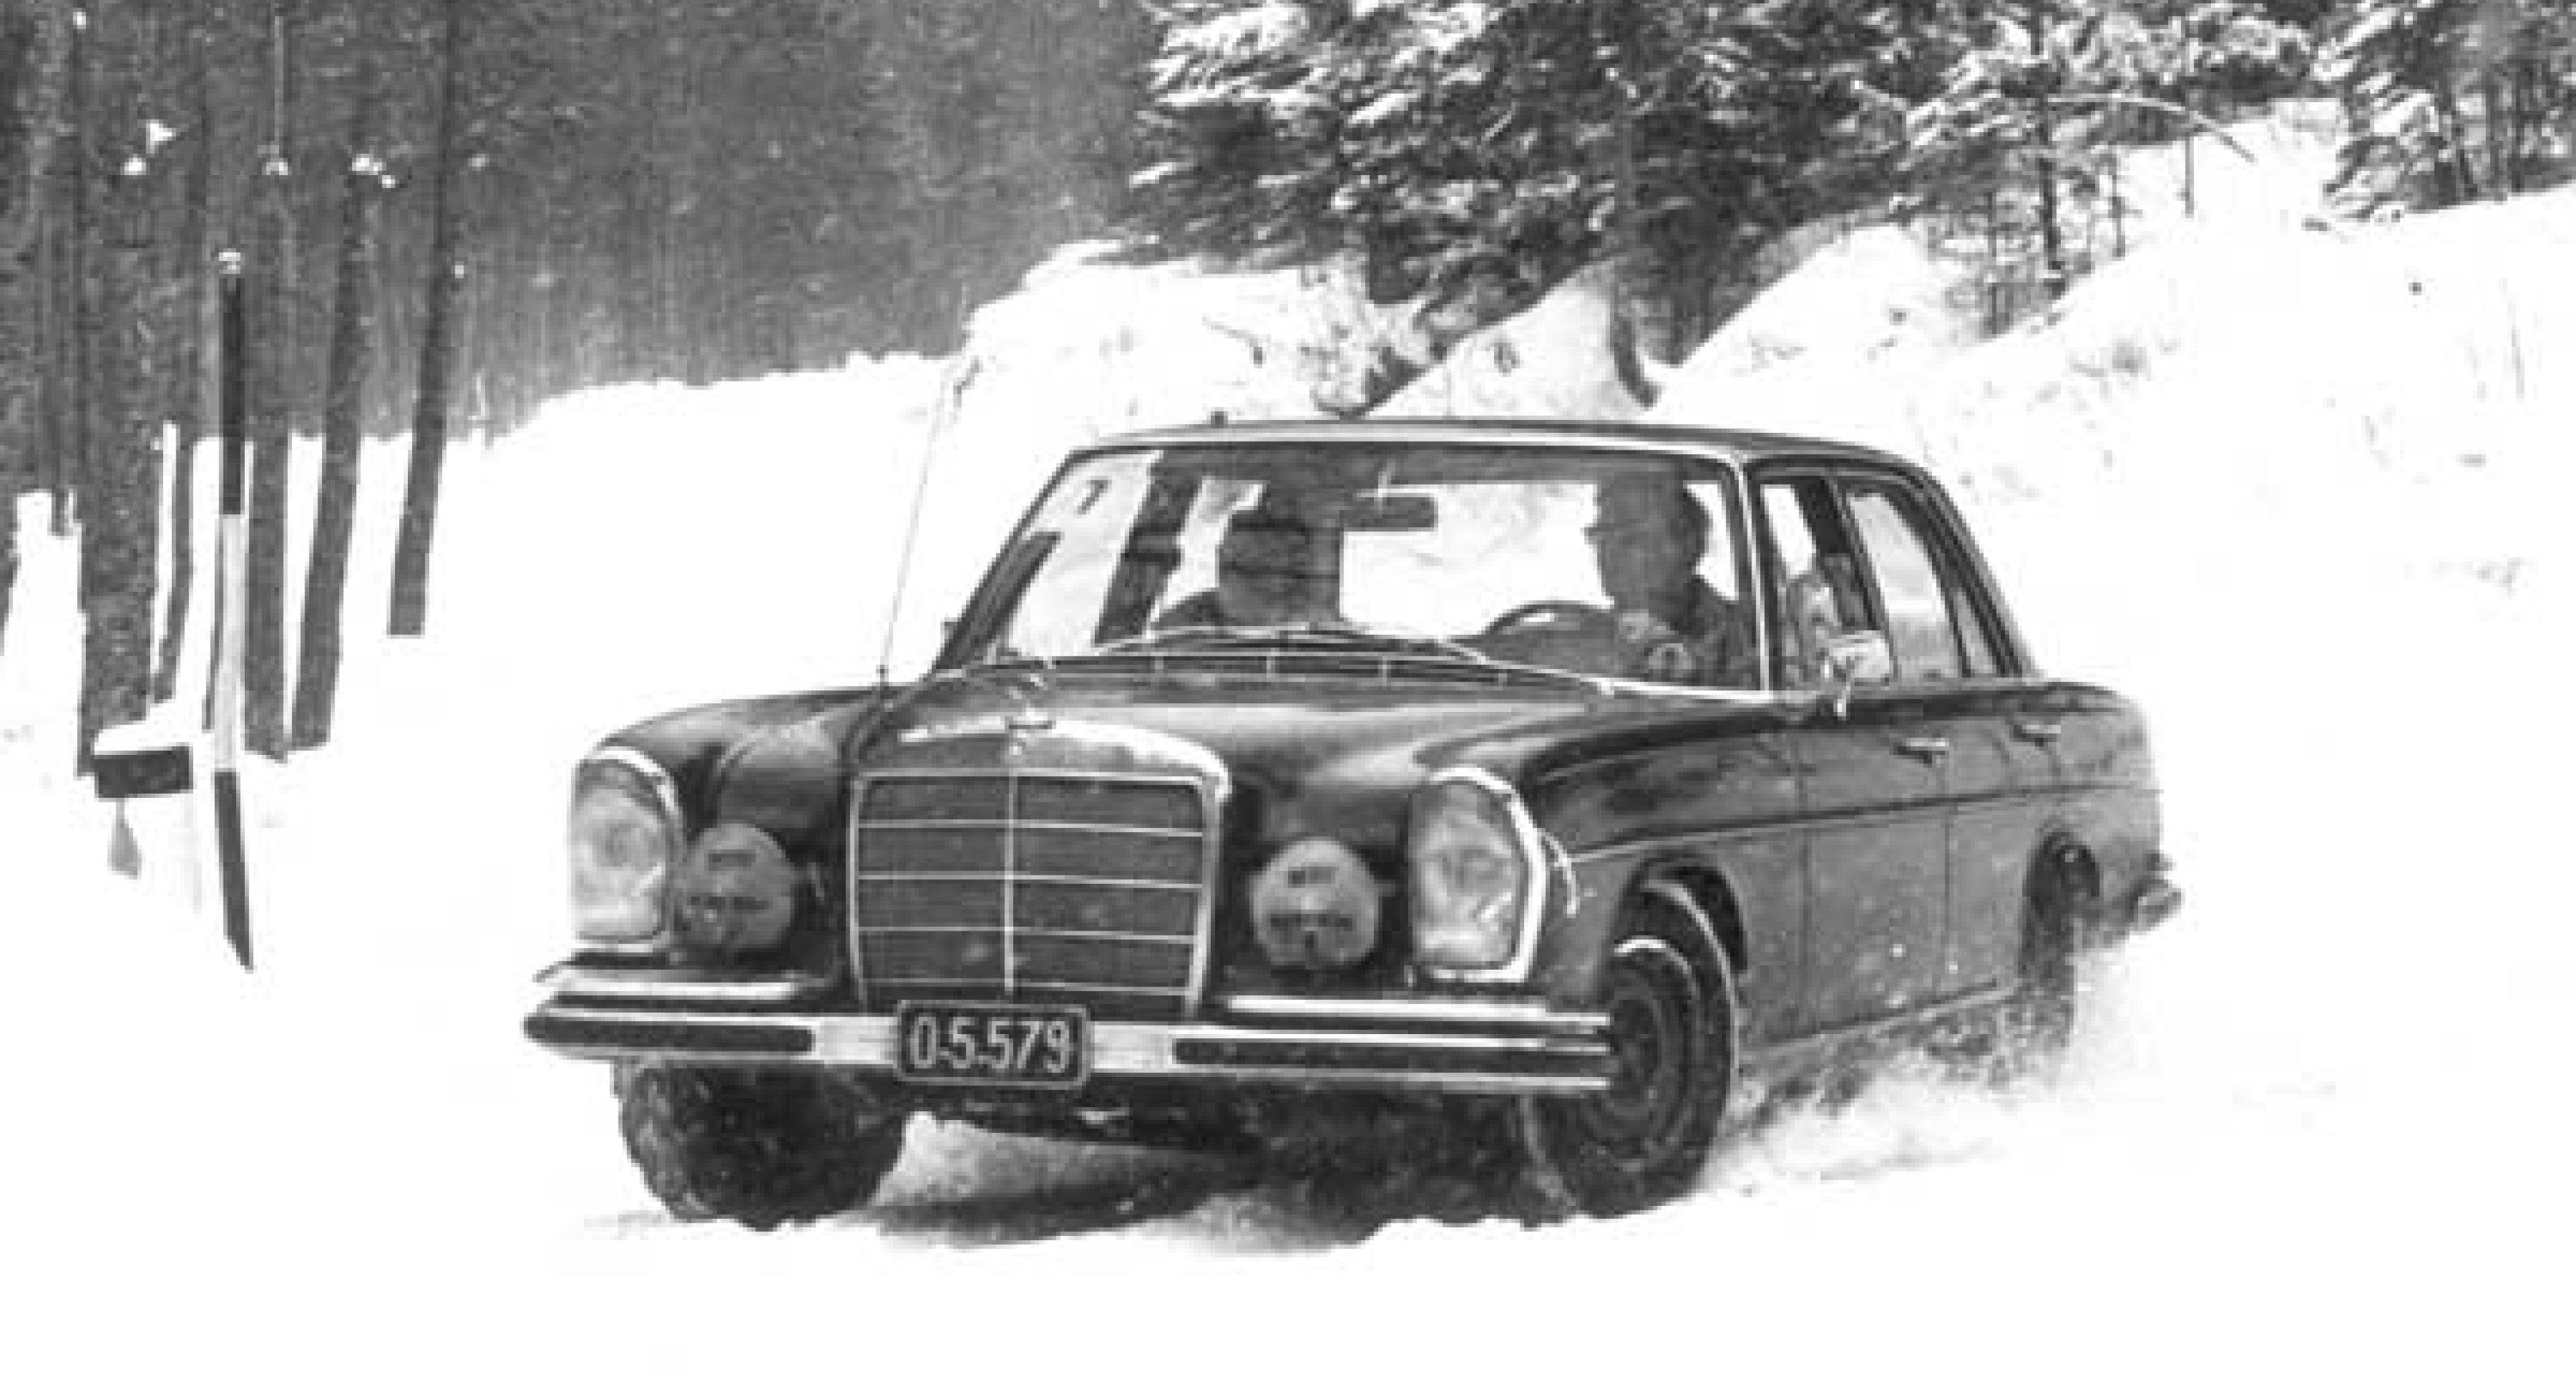 Vorschau -  Wintertourenfahrt am 24. Januar 2004